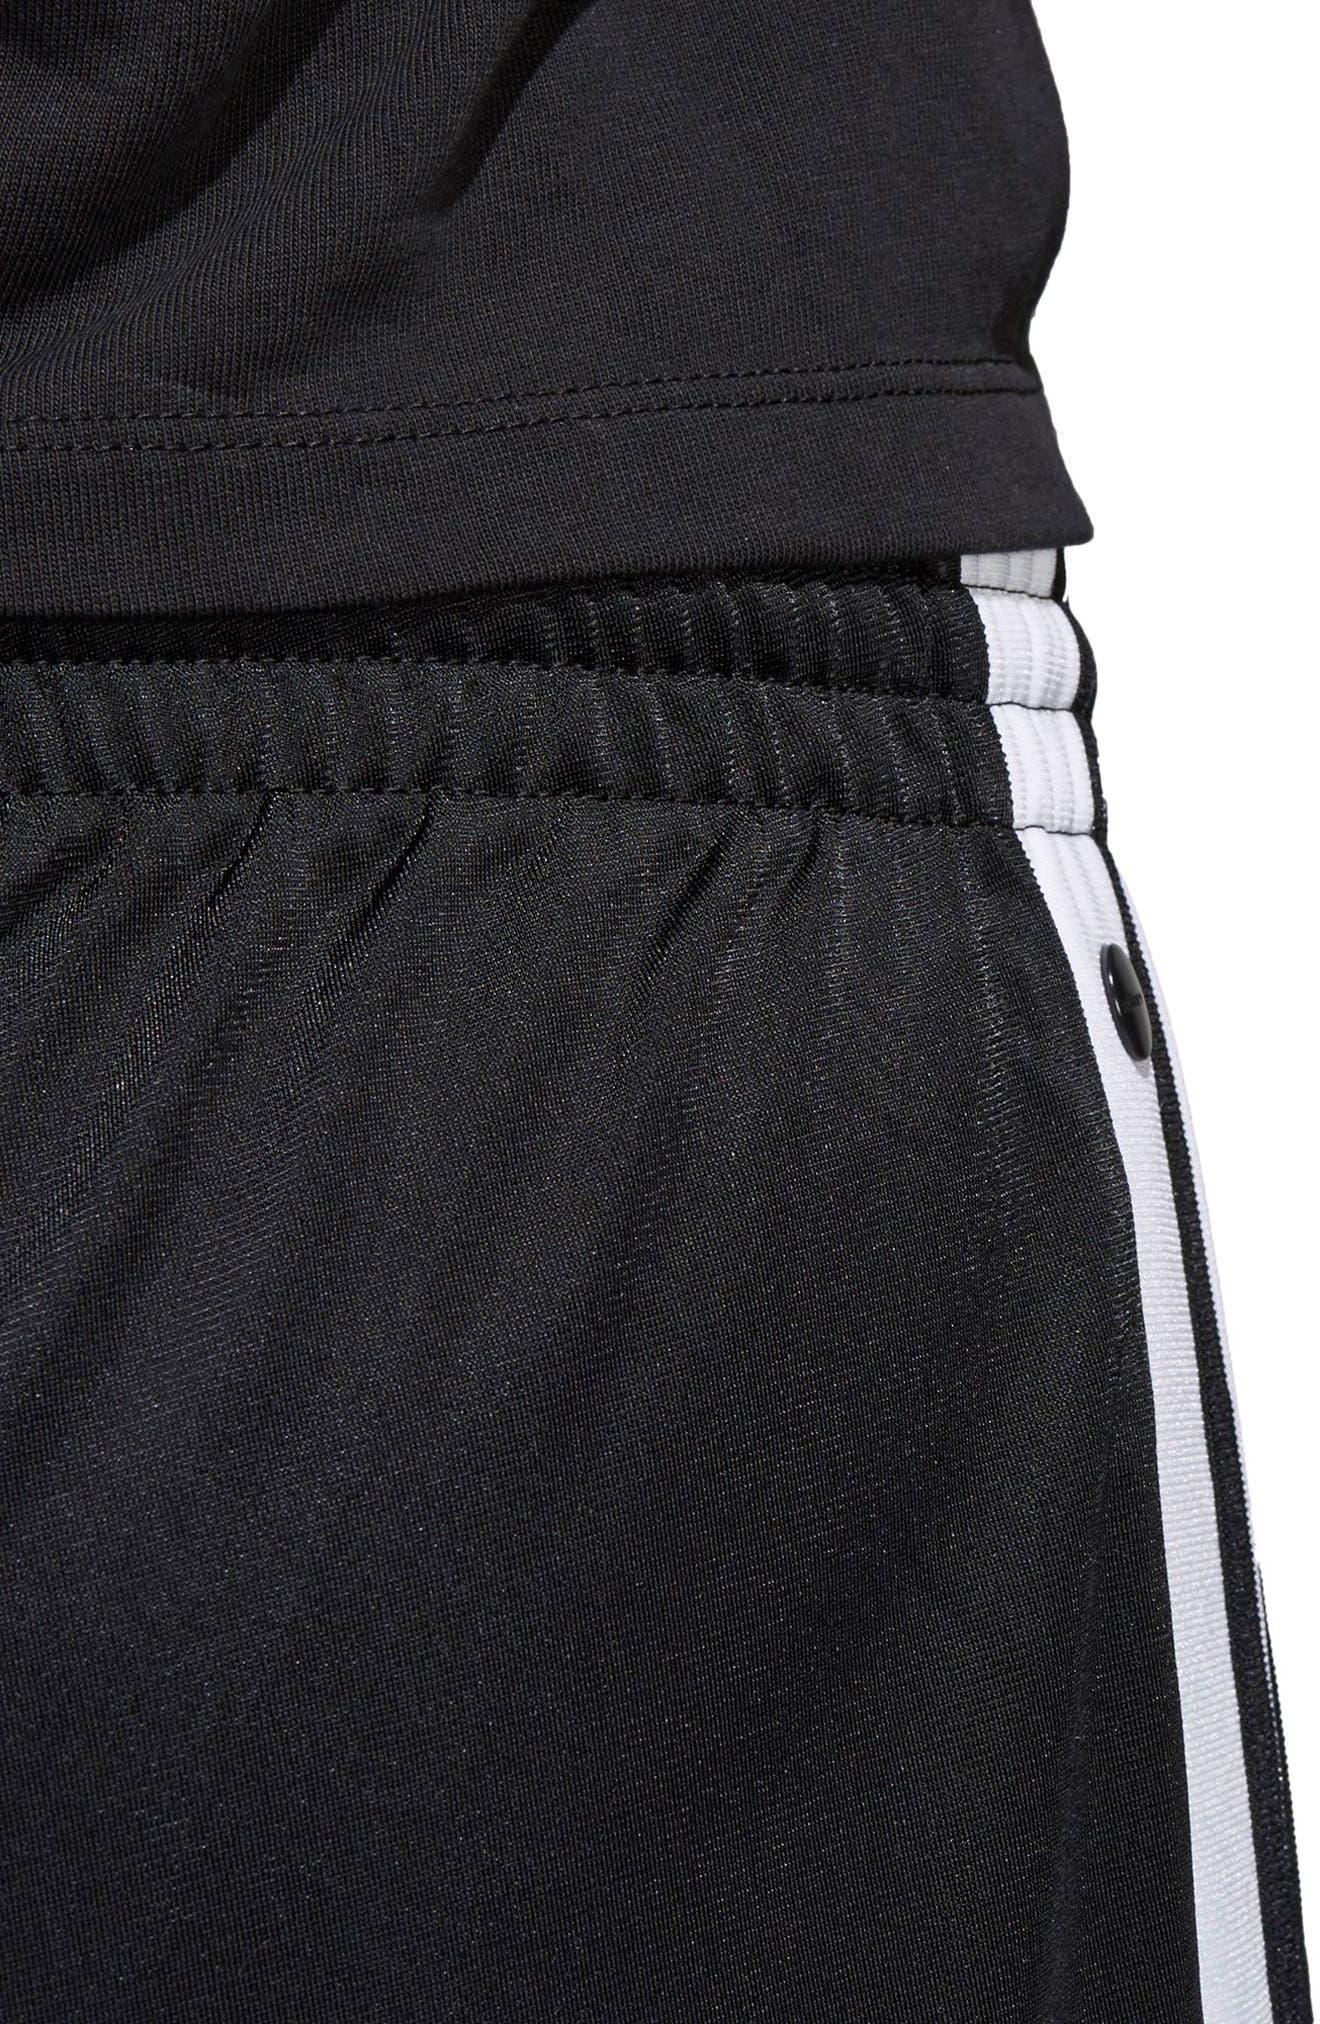 Adibreak Tearaway Track Pants,                             Alternate thumbnail 8, color,                             BLACK/ CARBON